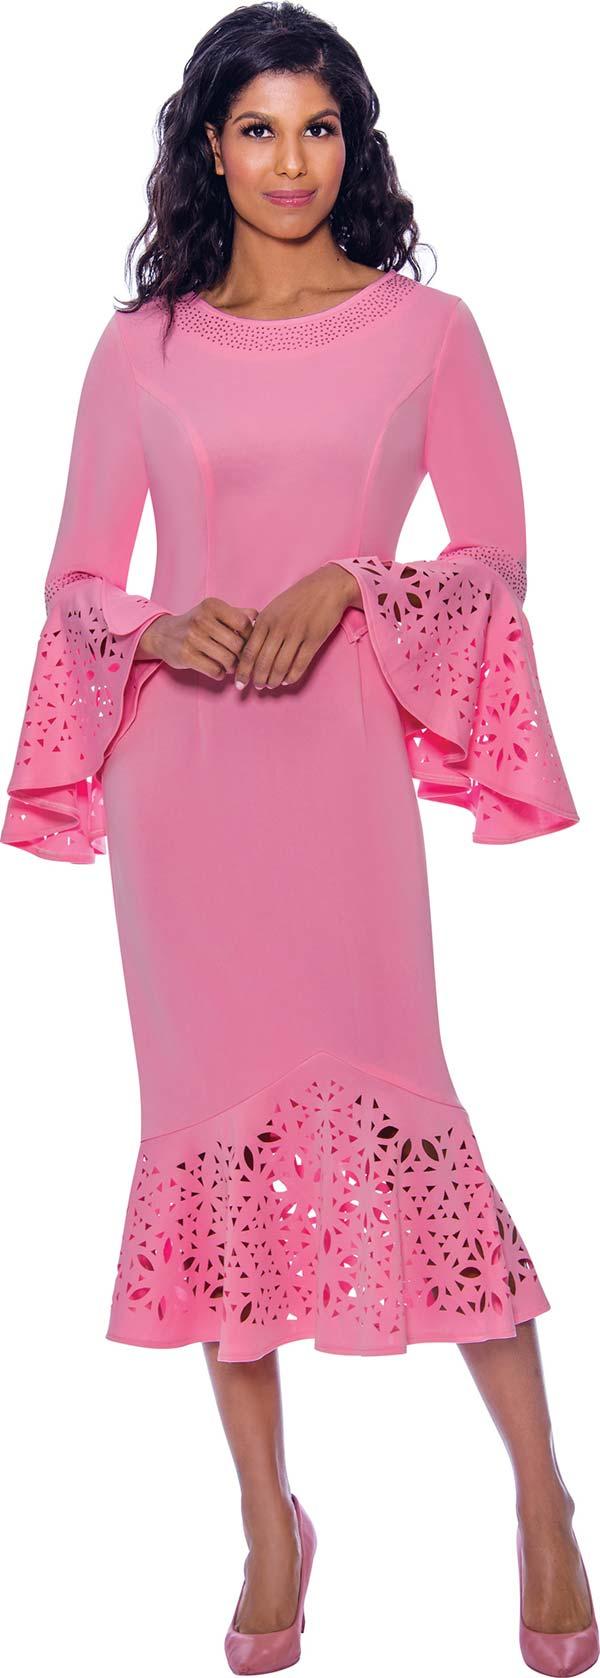 Nubiano Dresses DN2761-Pink - Rhinestone Embellished Boat Neckline Flounce Hem & Cuff Dress With Cut-Out Design